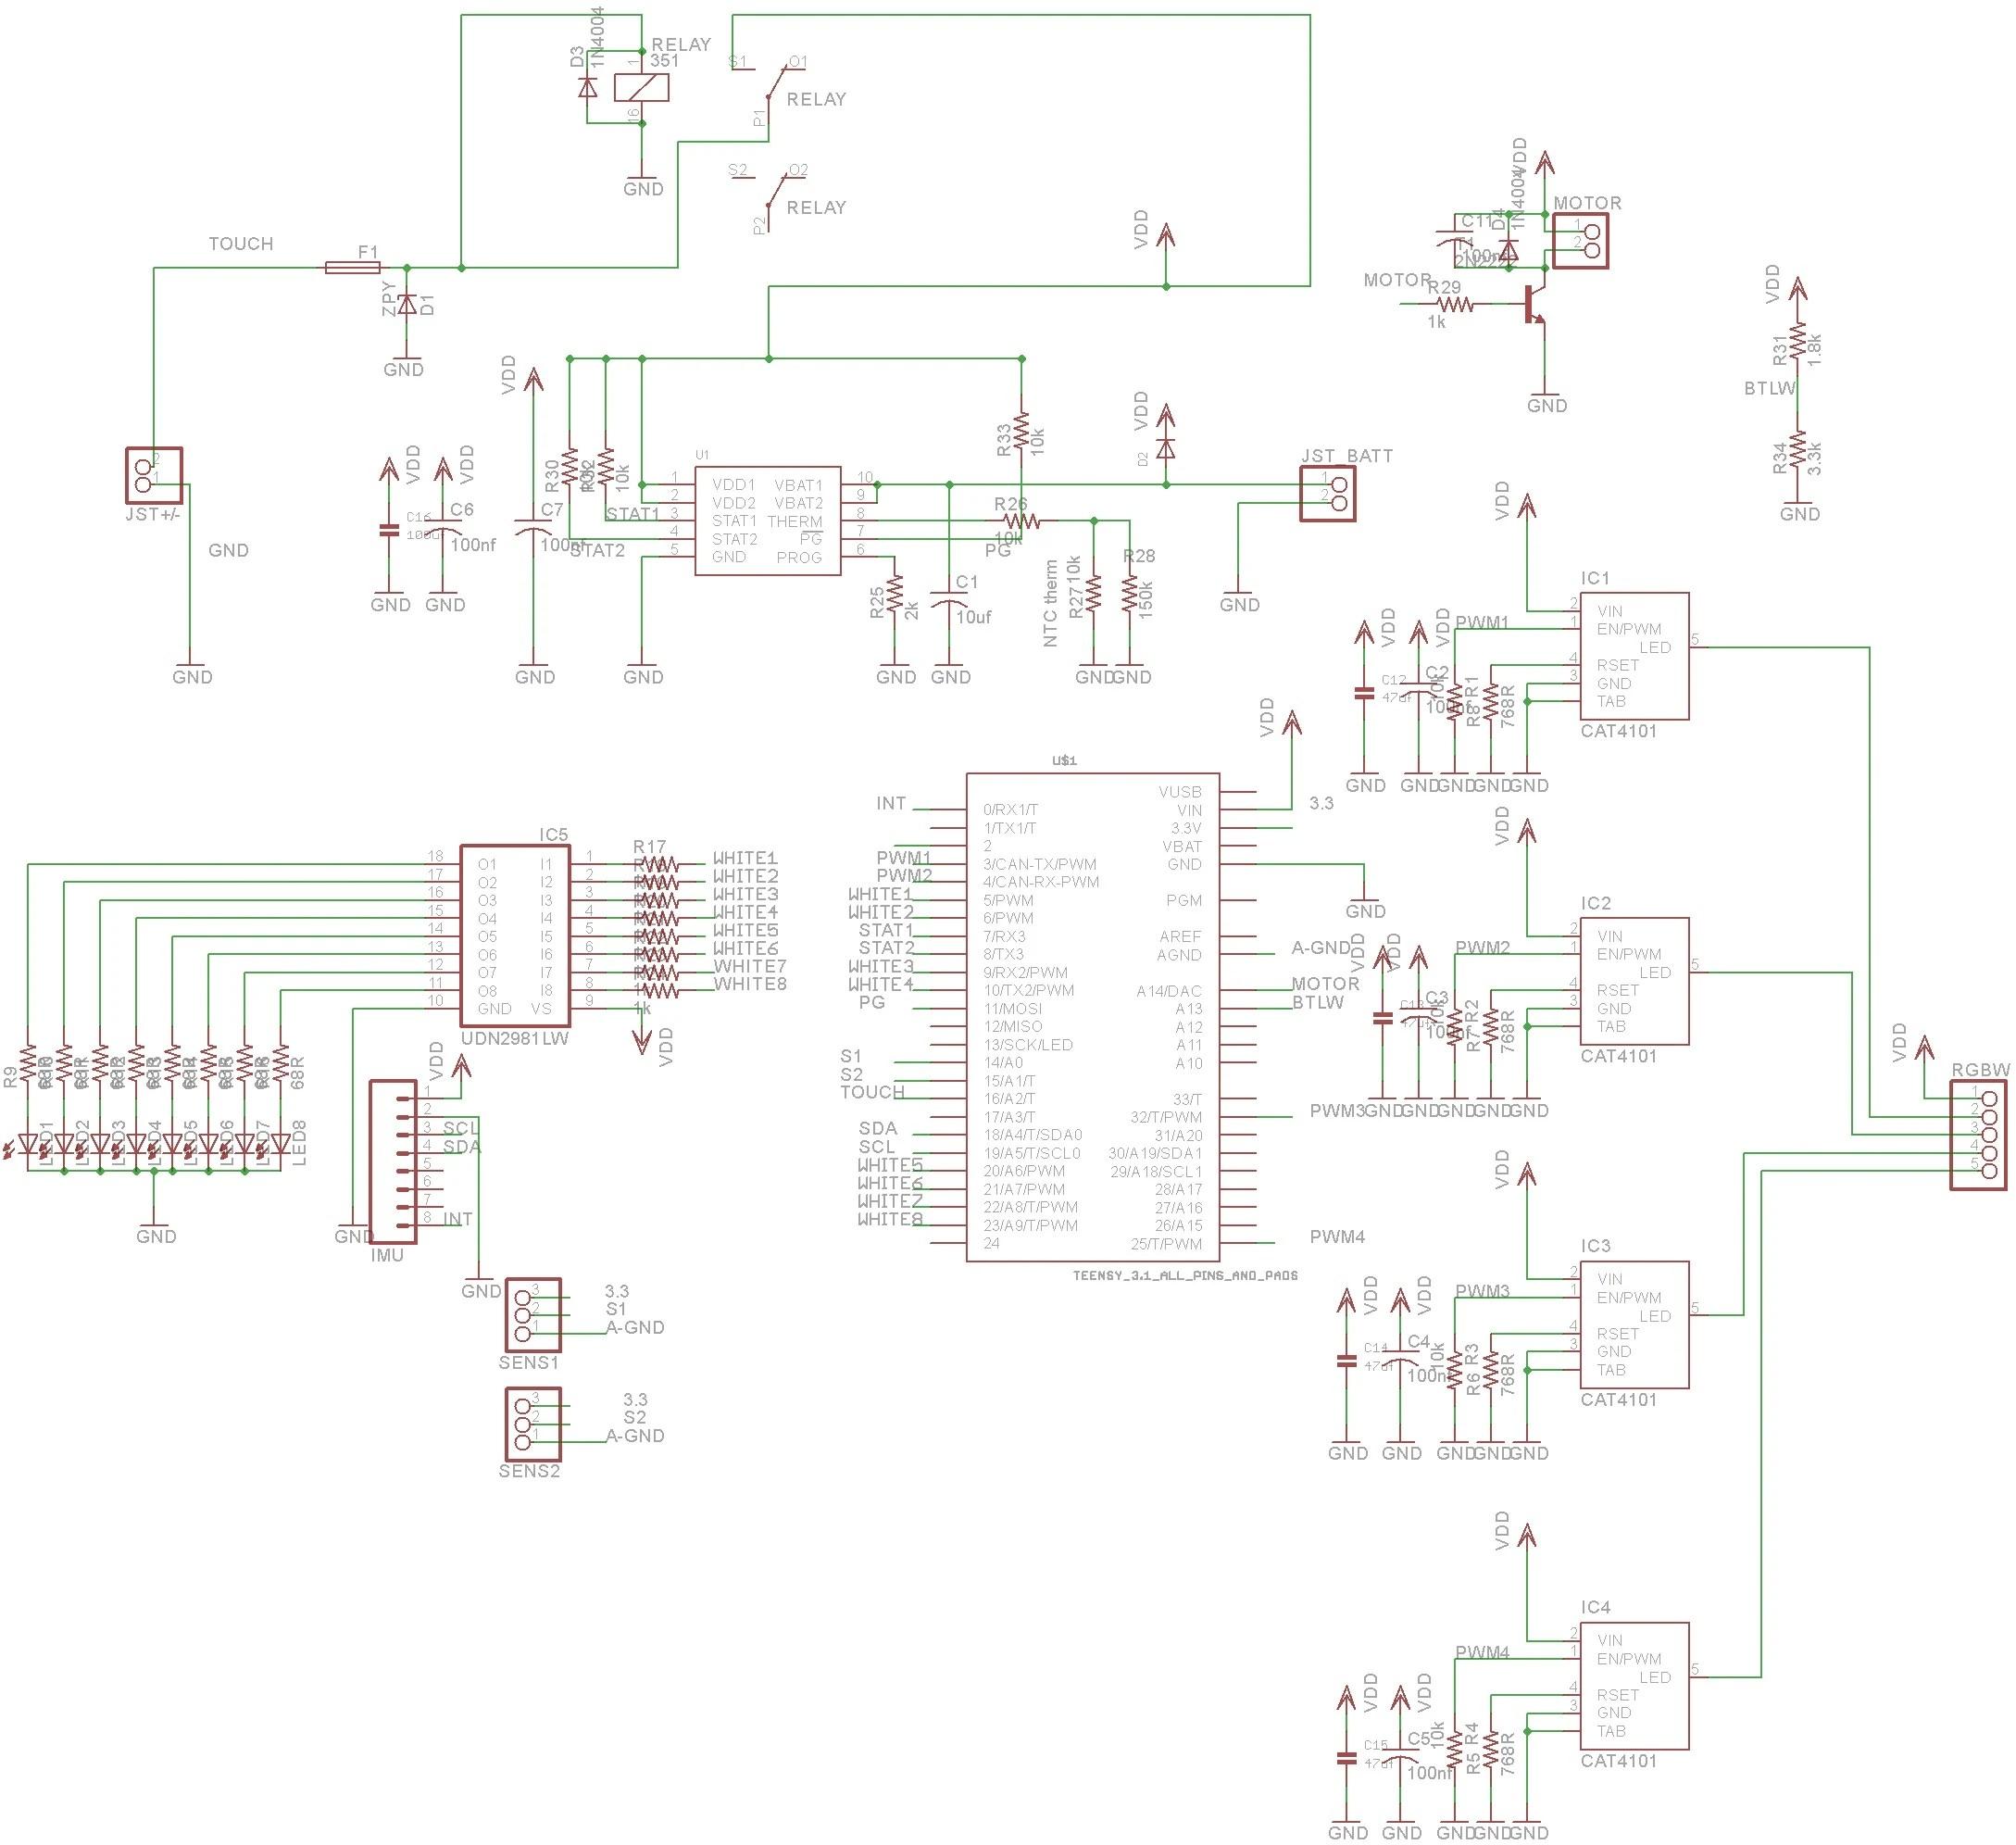 Eagle Create Pcb From Schematics